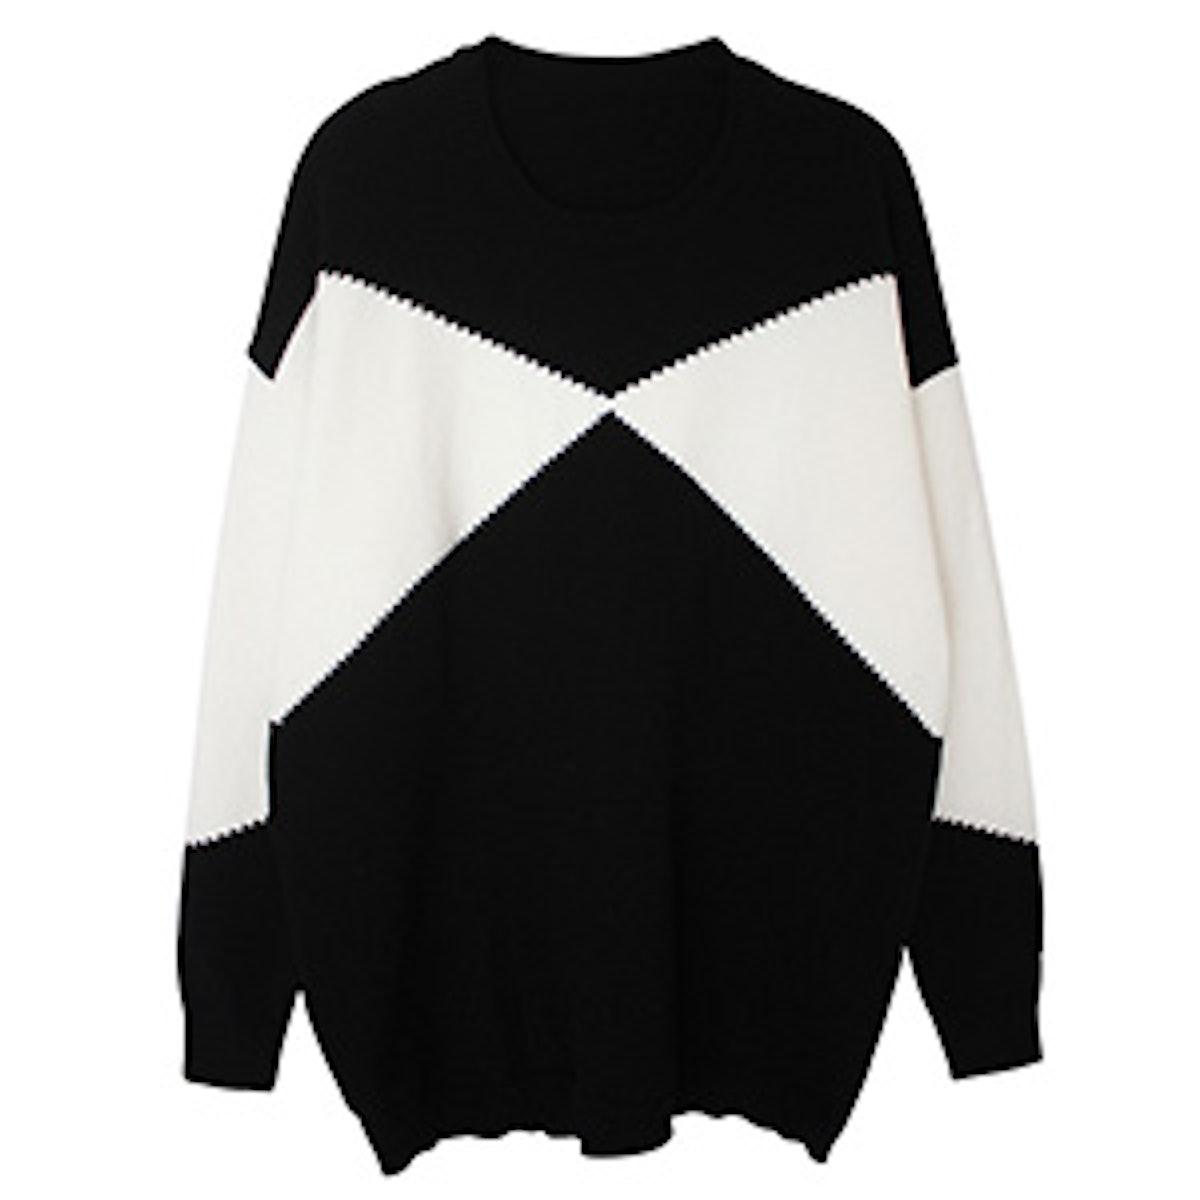 Black & White Oversized Sweater